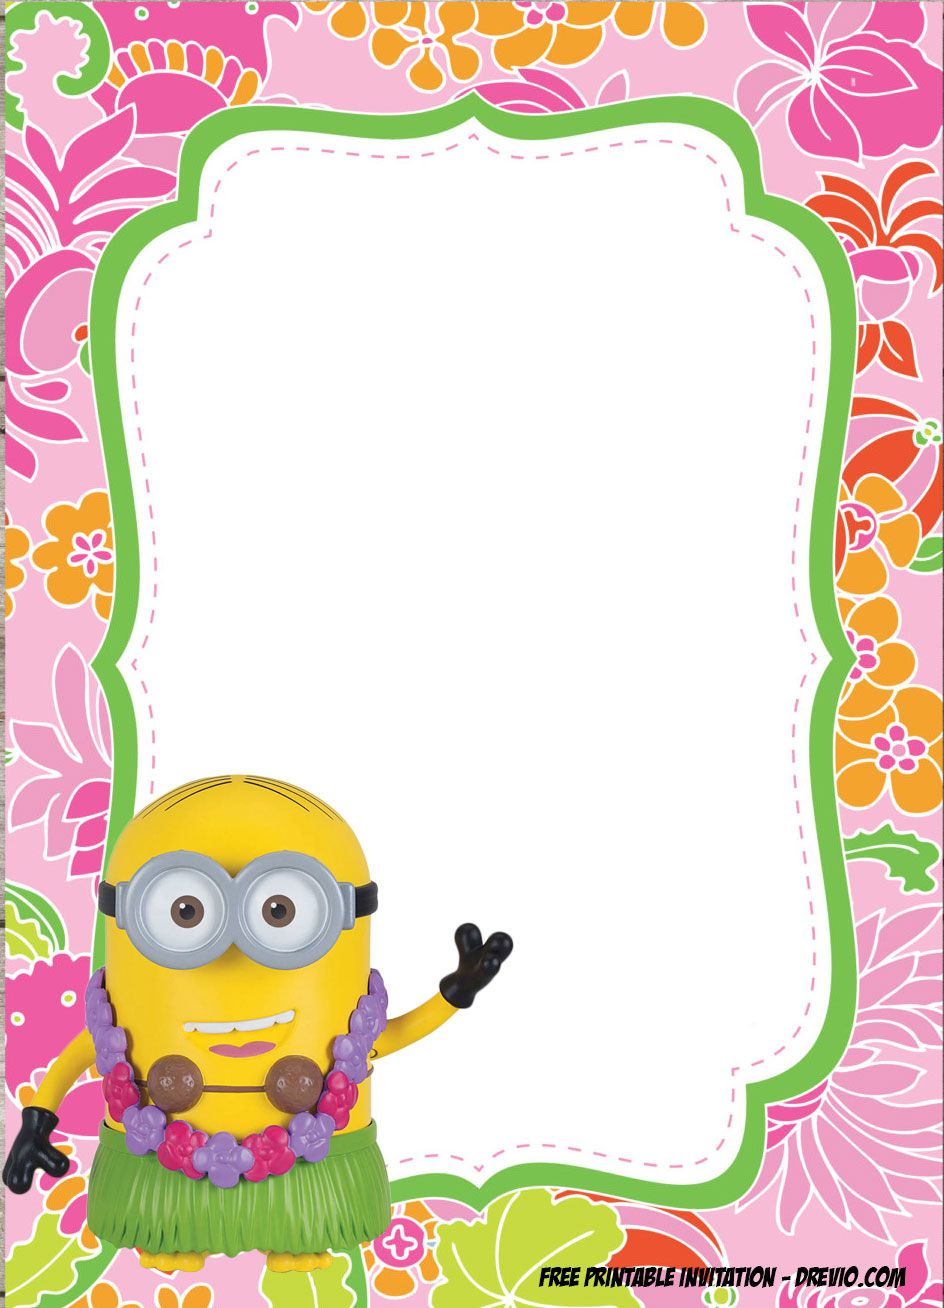 Free Minions Luau Birthday Invitation Template